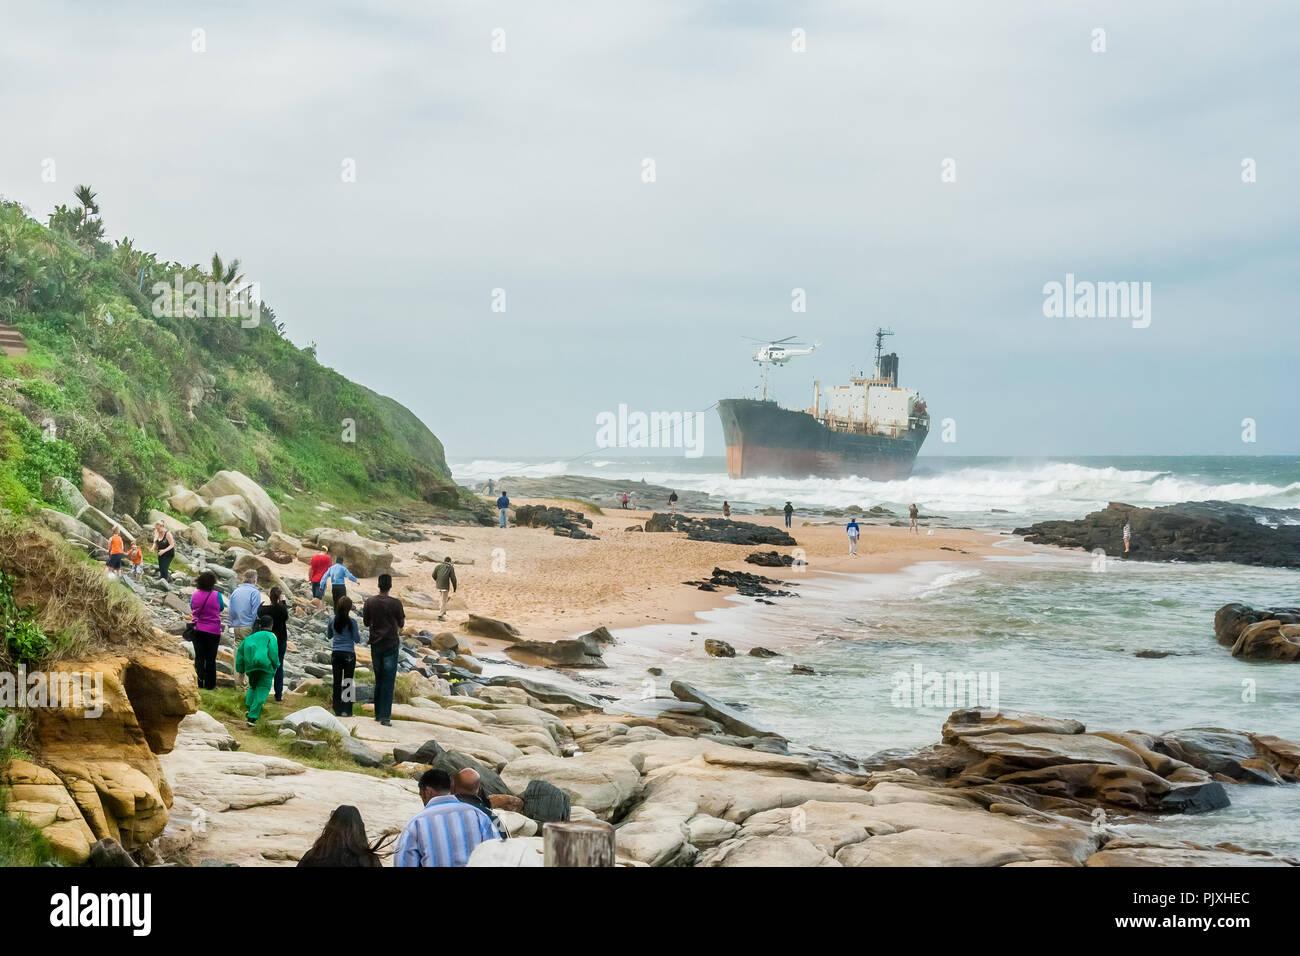 The Phoenix, a derelict bulk tanker, run aground on Sheffield Beach on Durban's North Coast - Stock Image